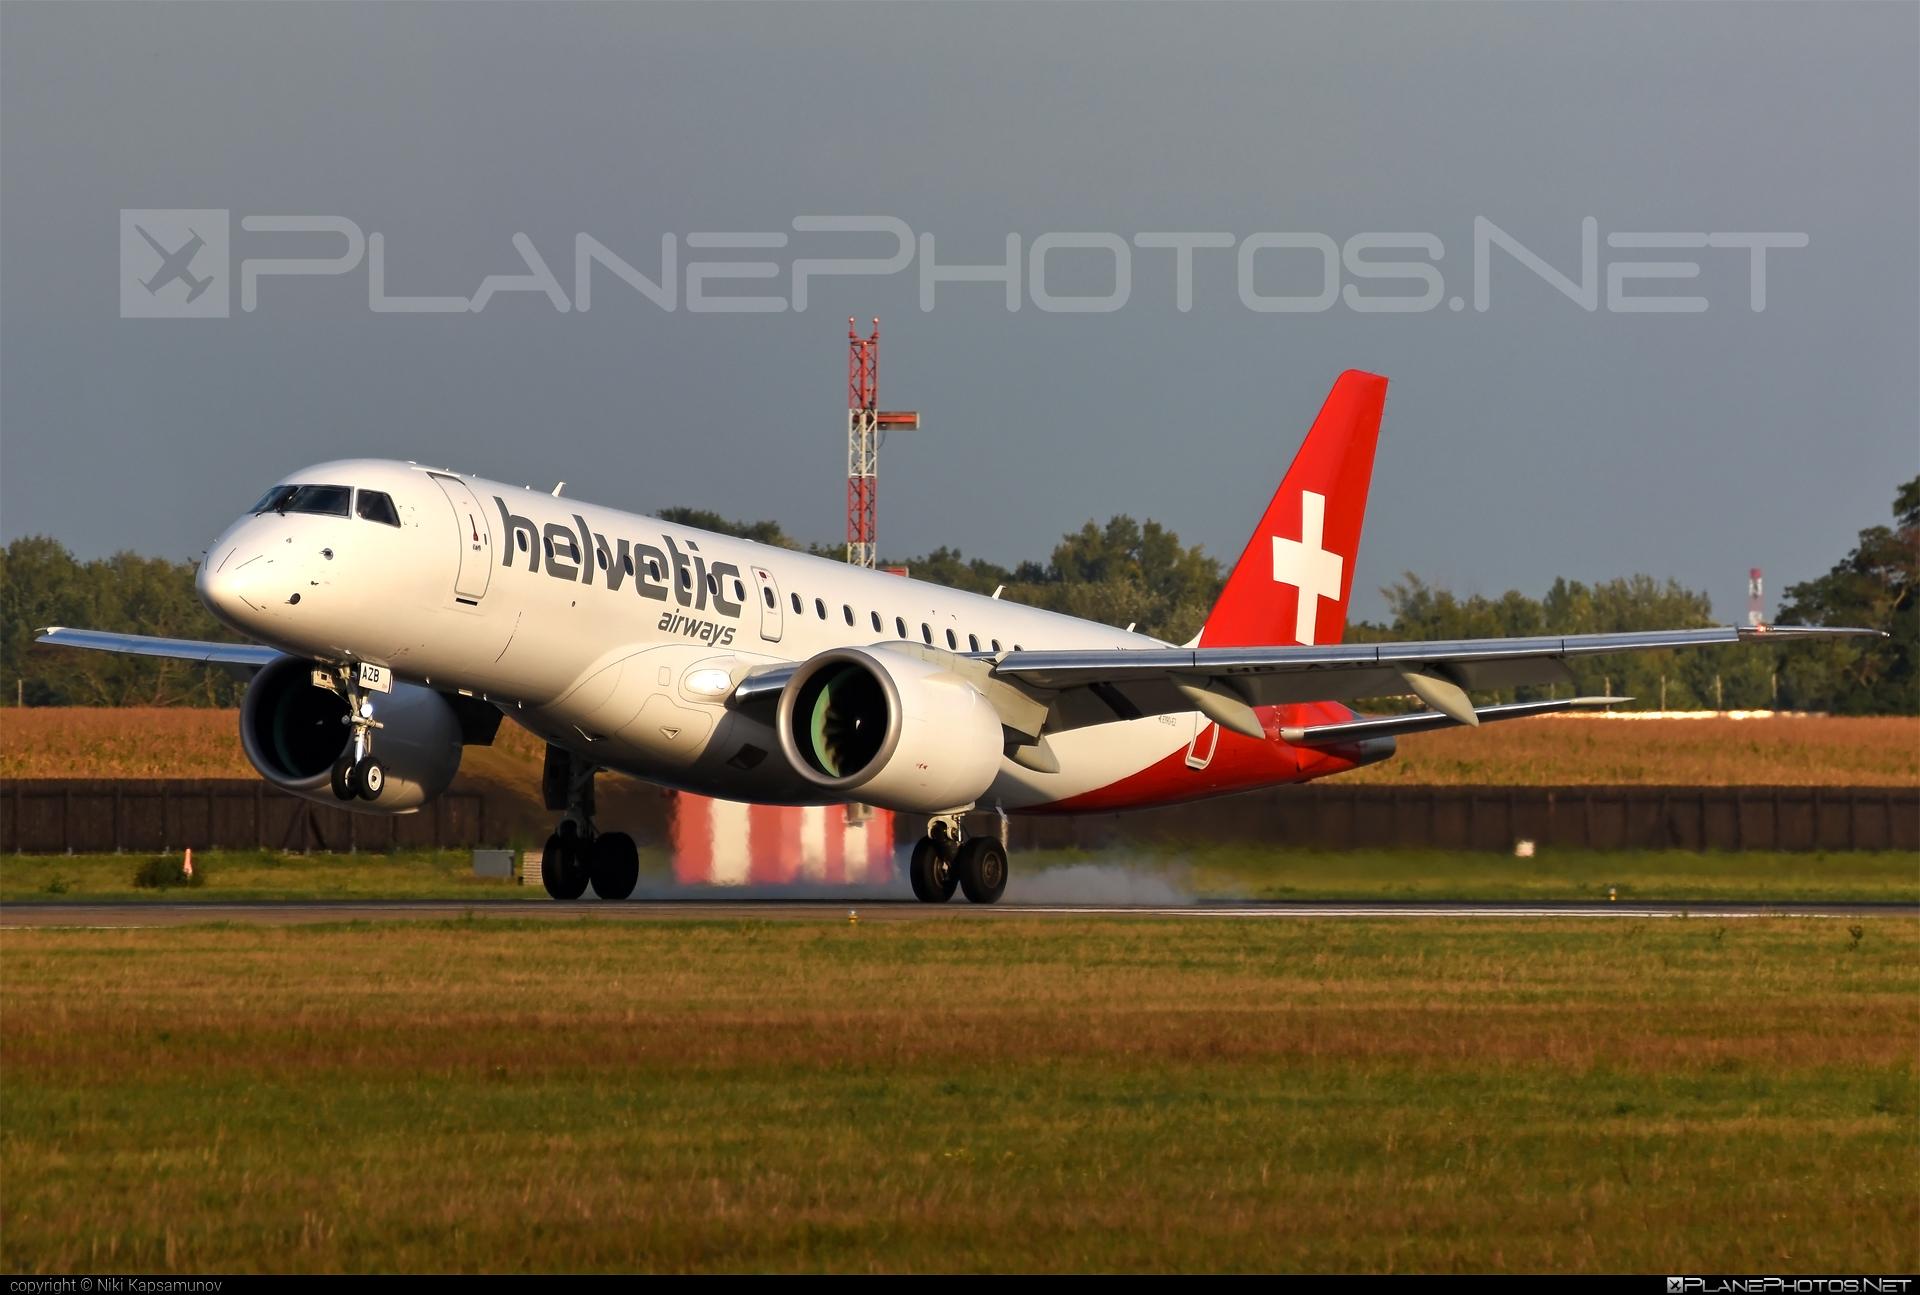 Embraer E190-E2 (ERJ-190-300STD) - HB-AZB operated by Helvetic Airways #e190 #e190e2 #embraer #embraer190 #embraer190300 #embraer190300std #embraer190e2 #erj190300 #erj190300std